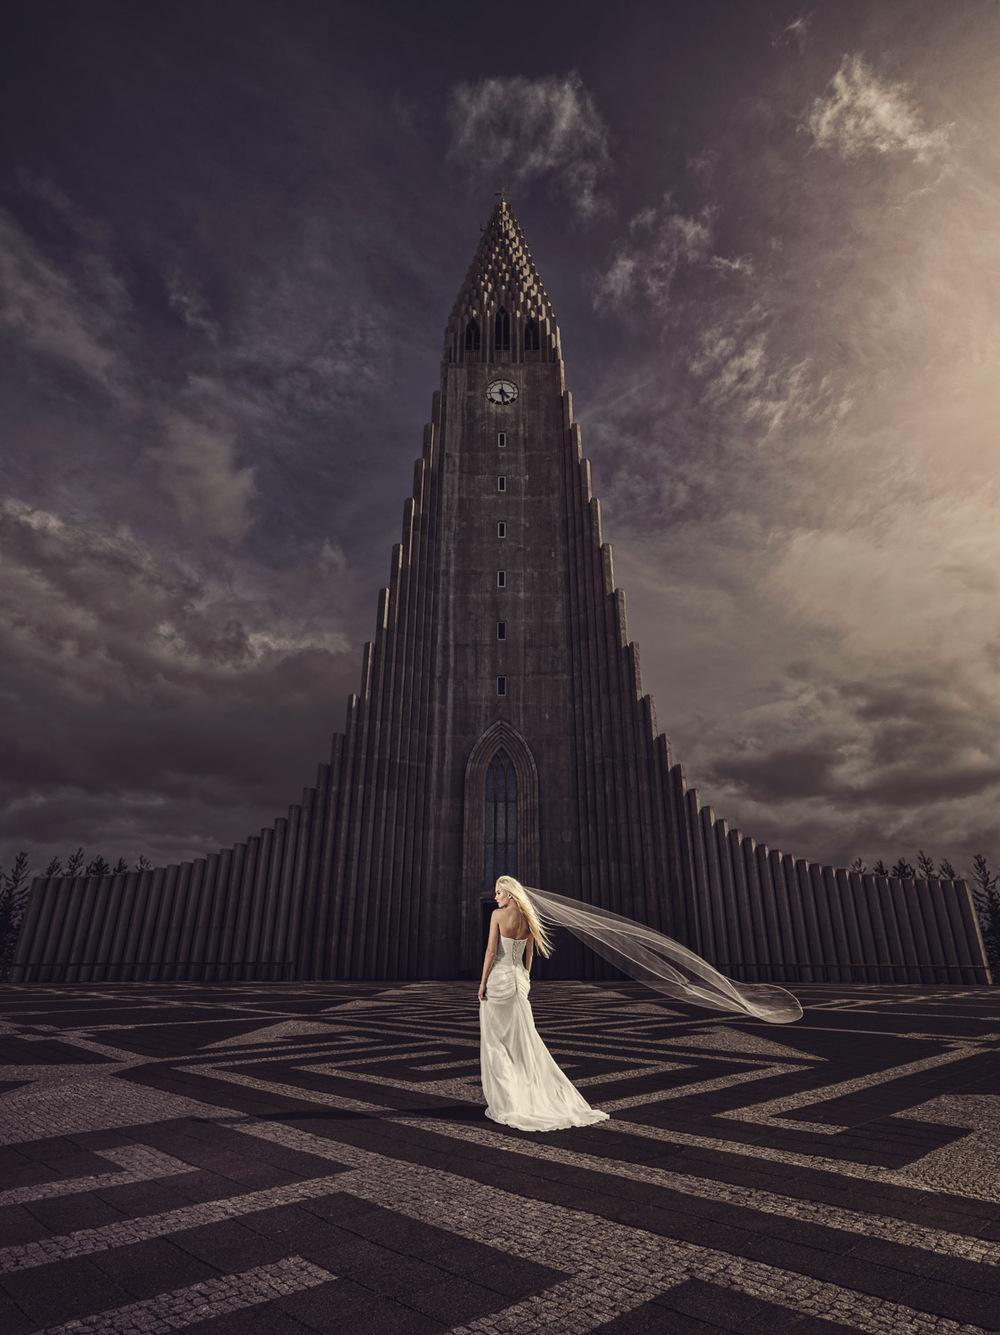 stlouis_wedding_photography_B0007056_Final.jpg